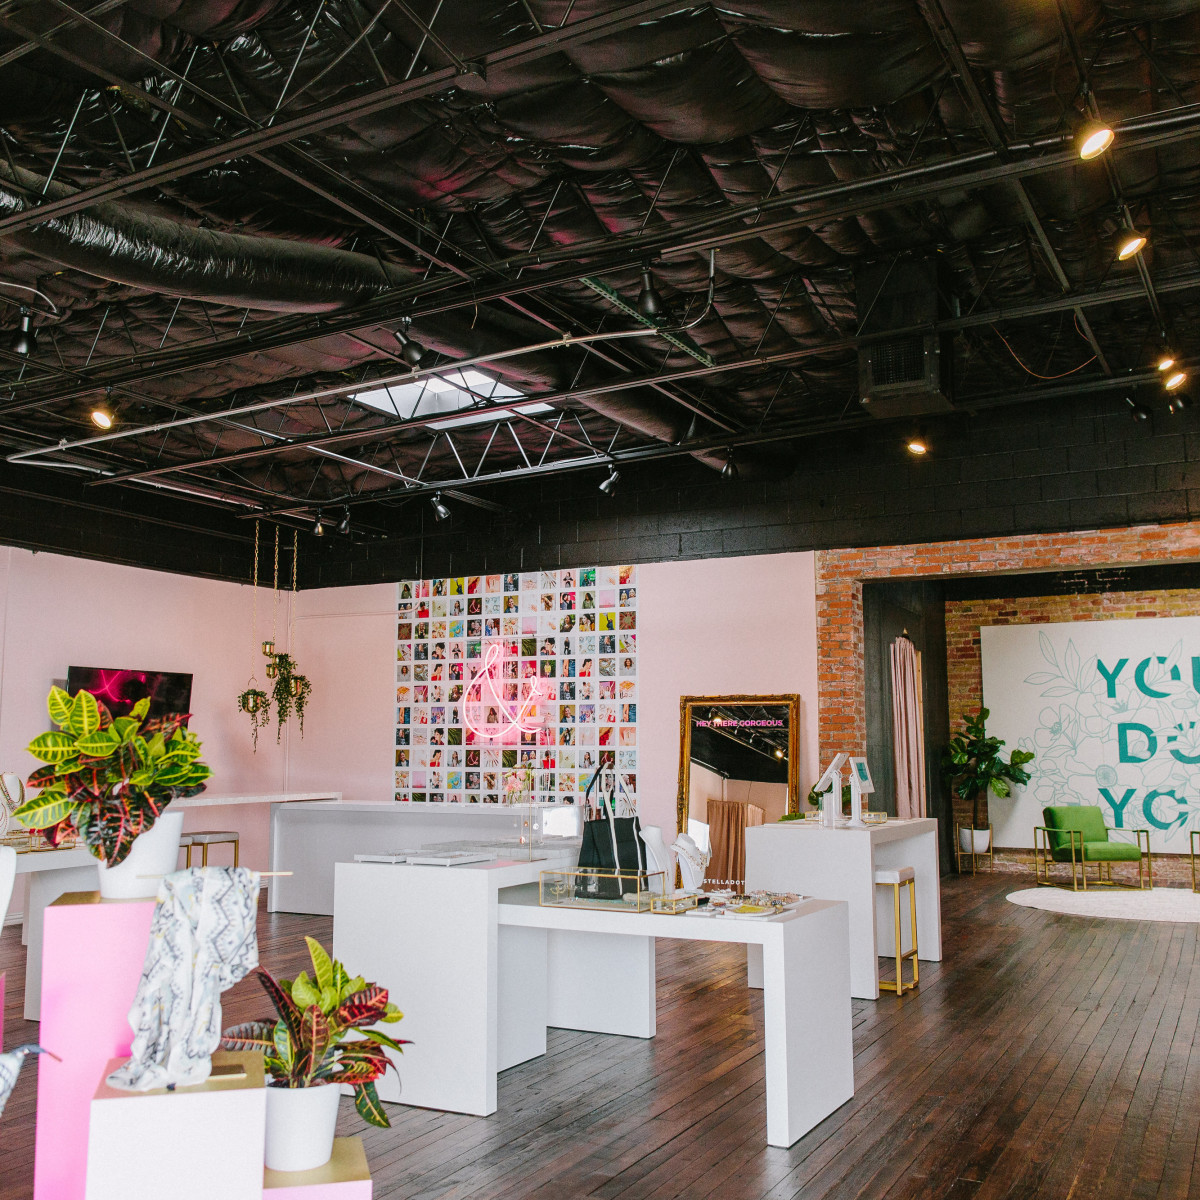 Stella & Dot pop-up shop Dallas